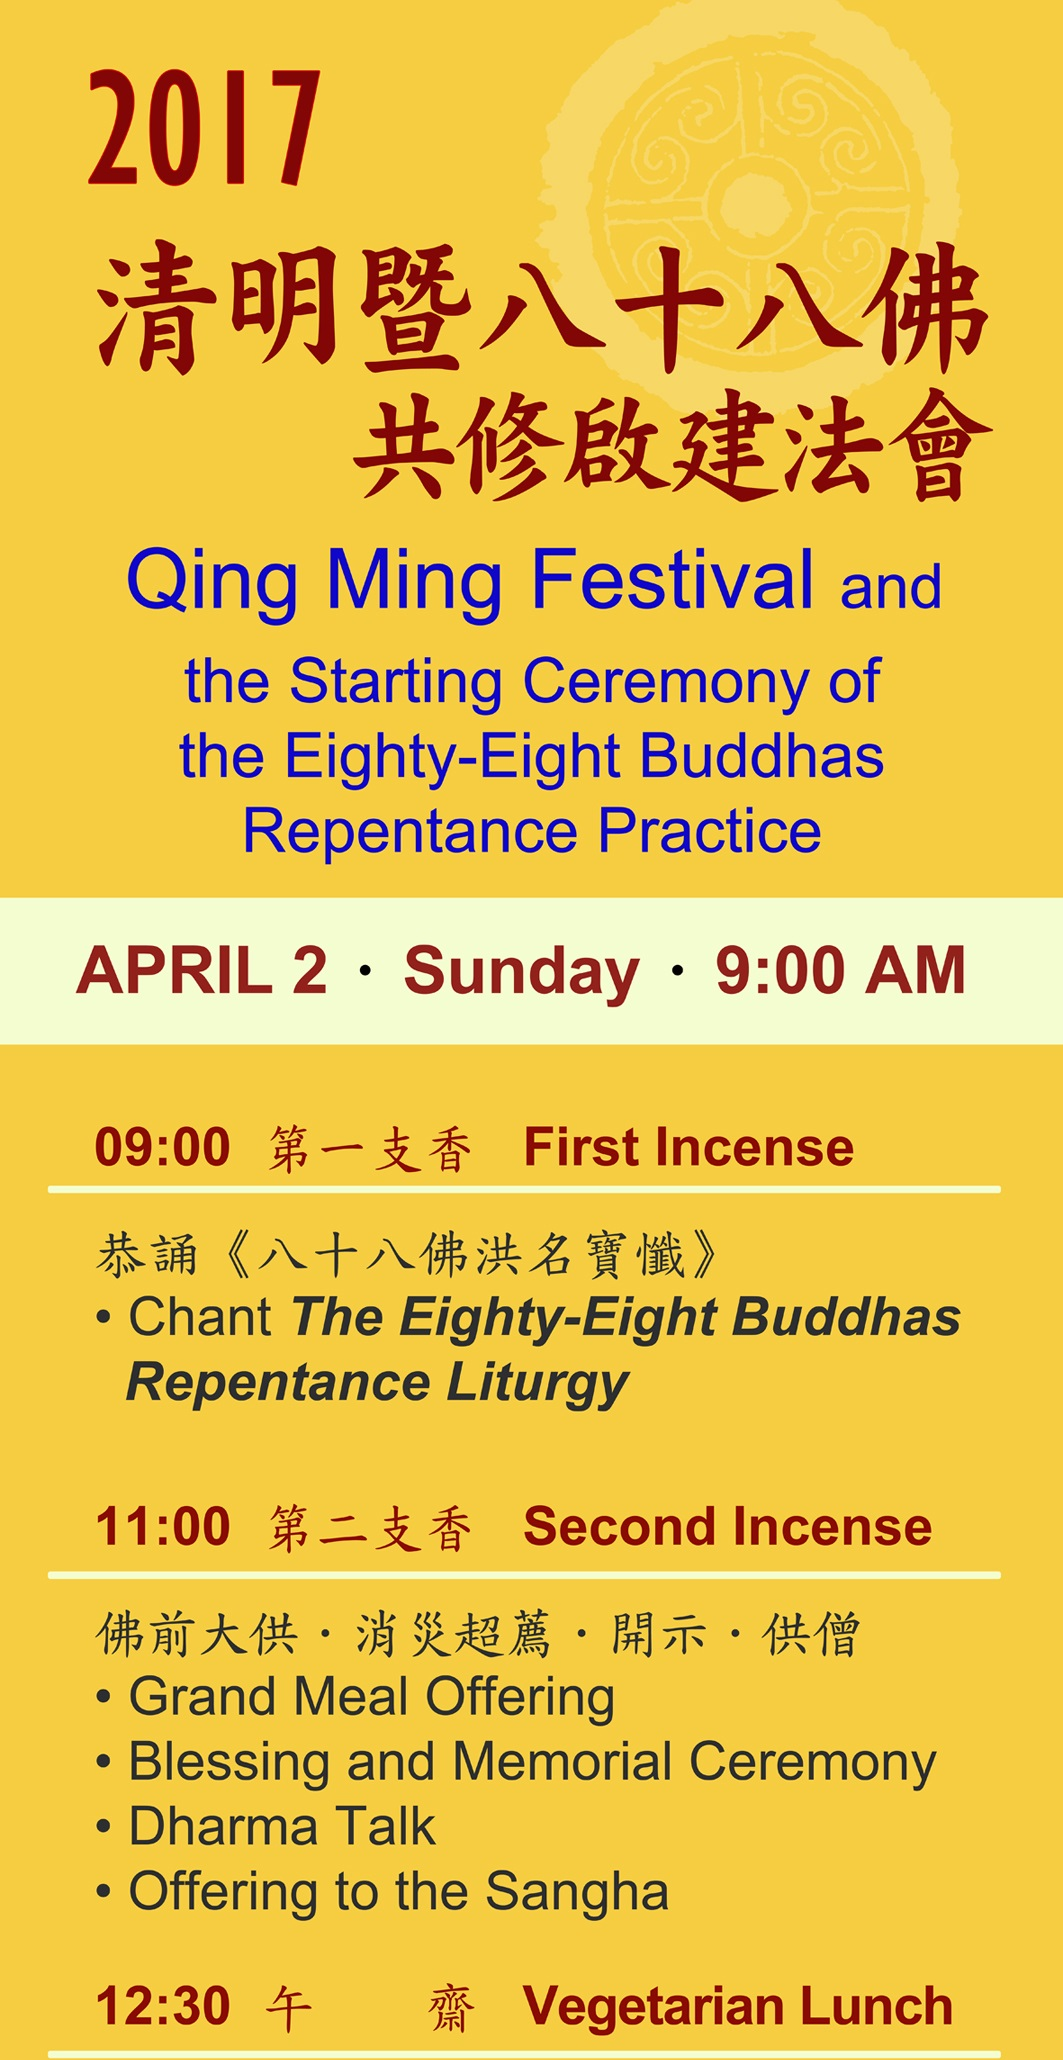 2017 Qing Ming Festival